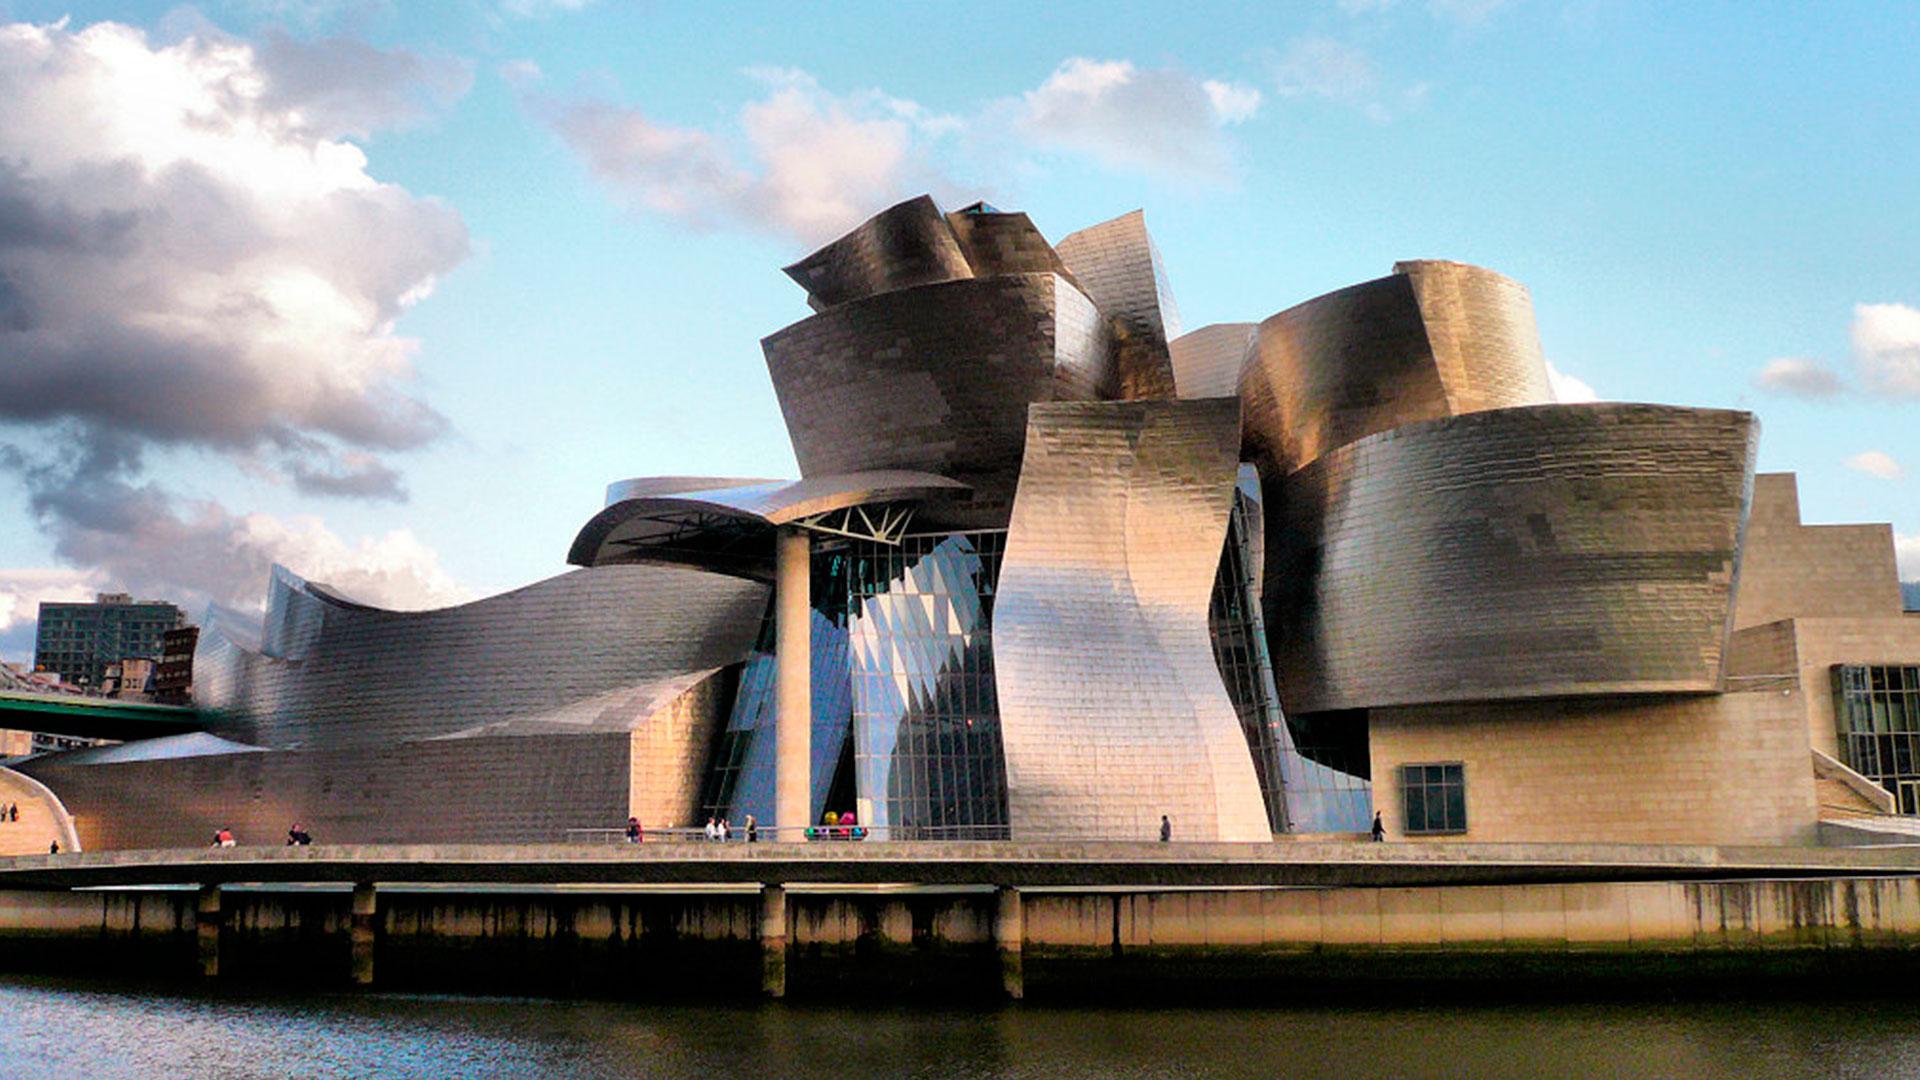 Descubriendo Bilbao hero asset